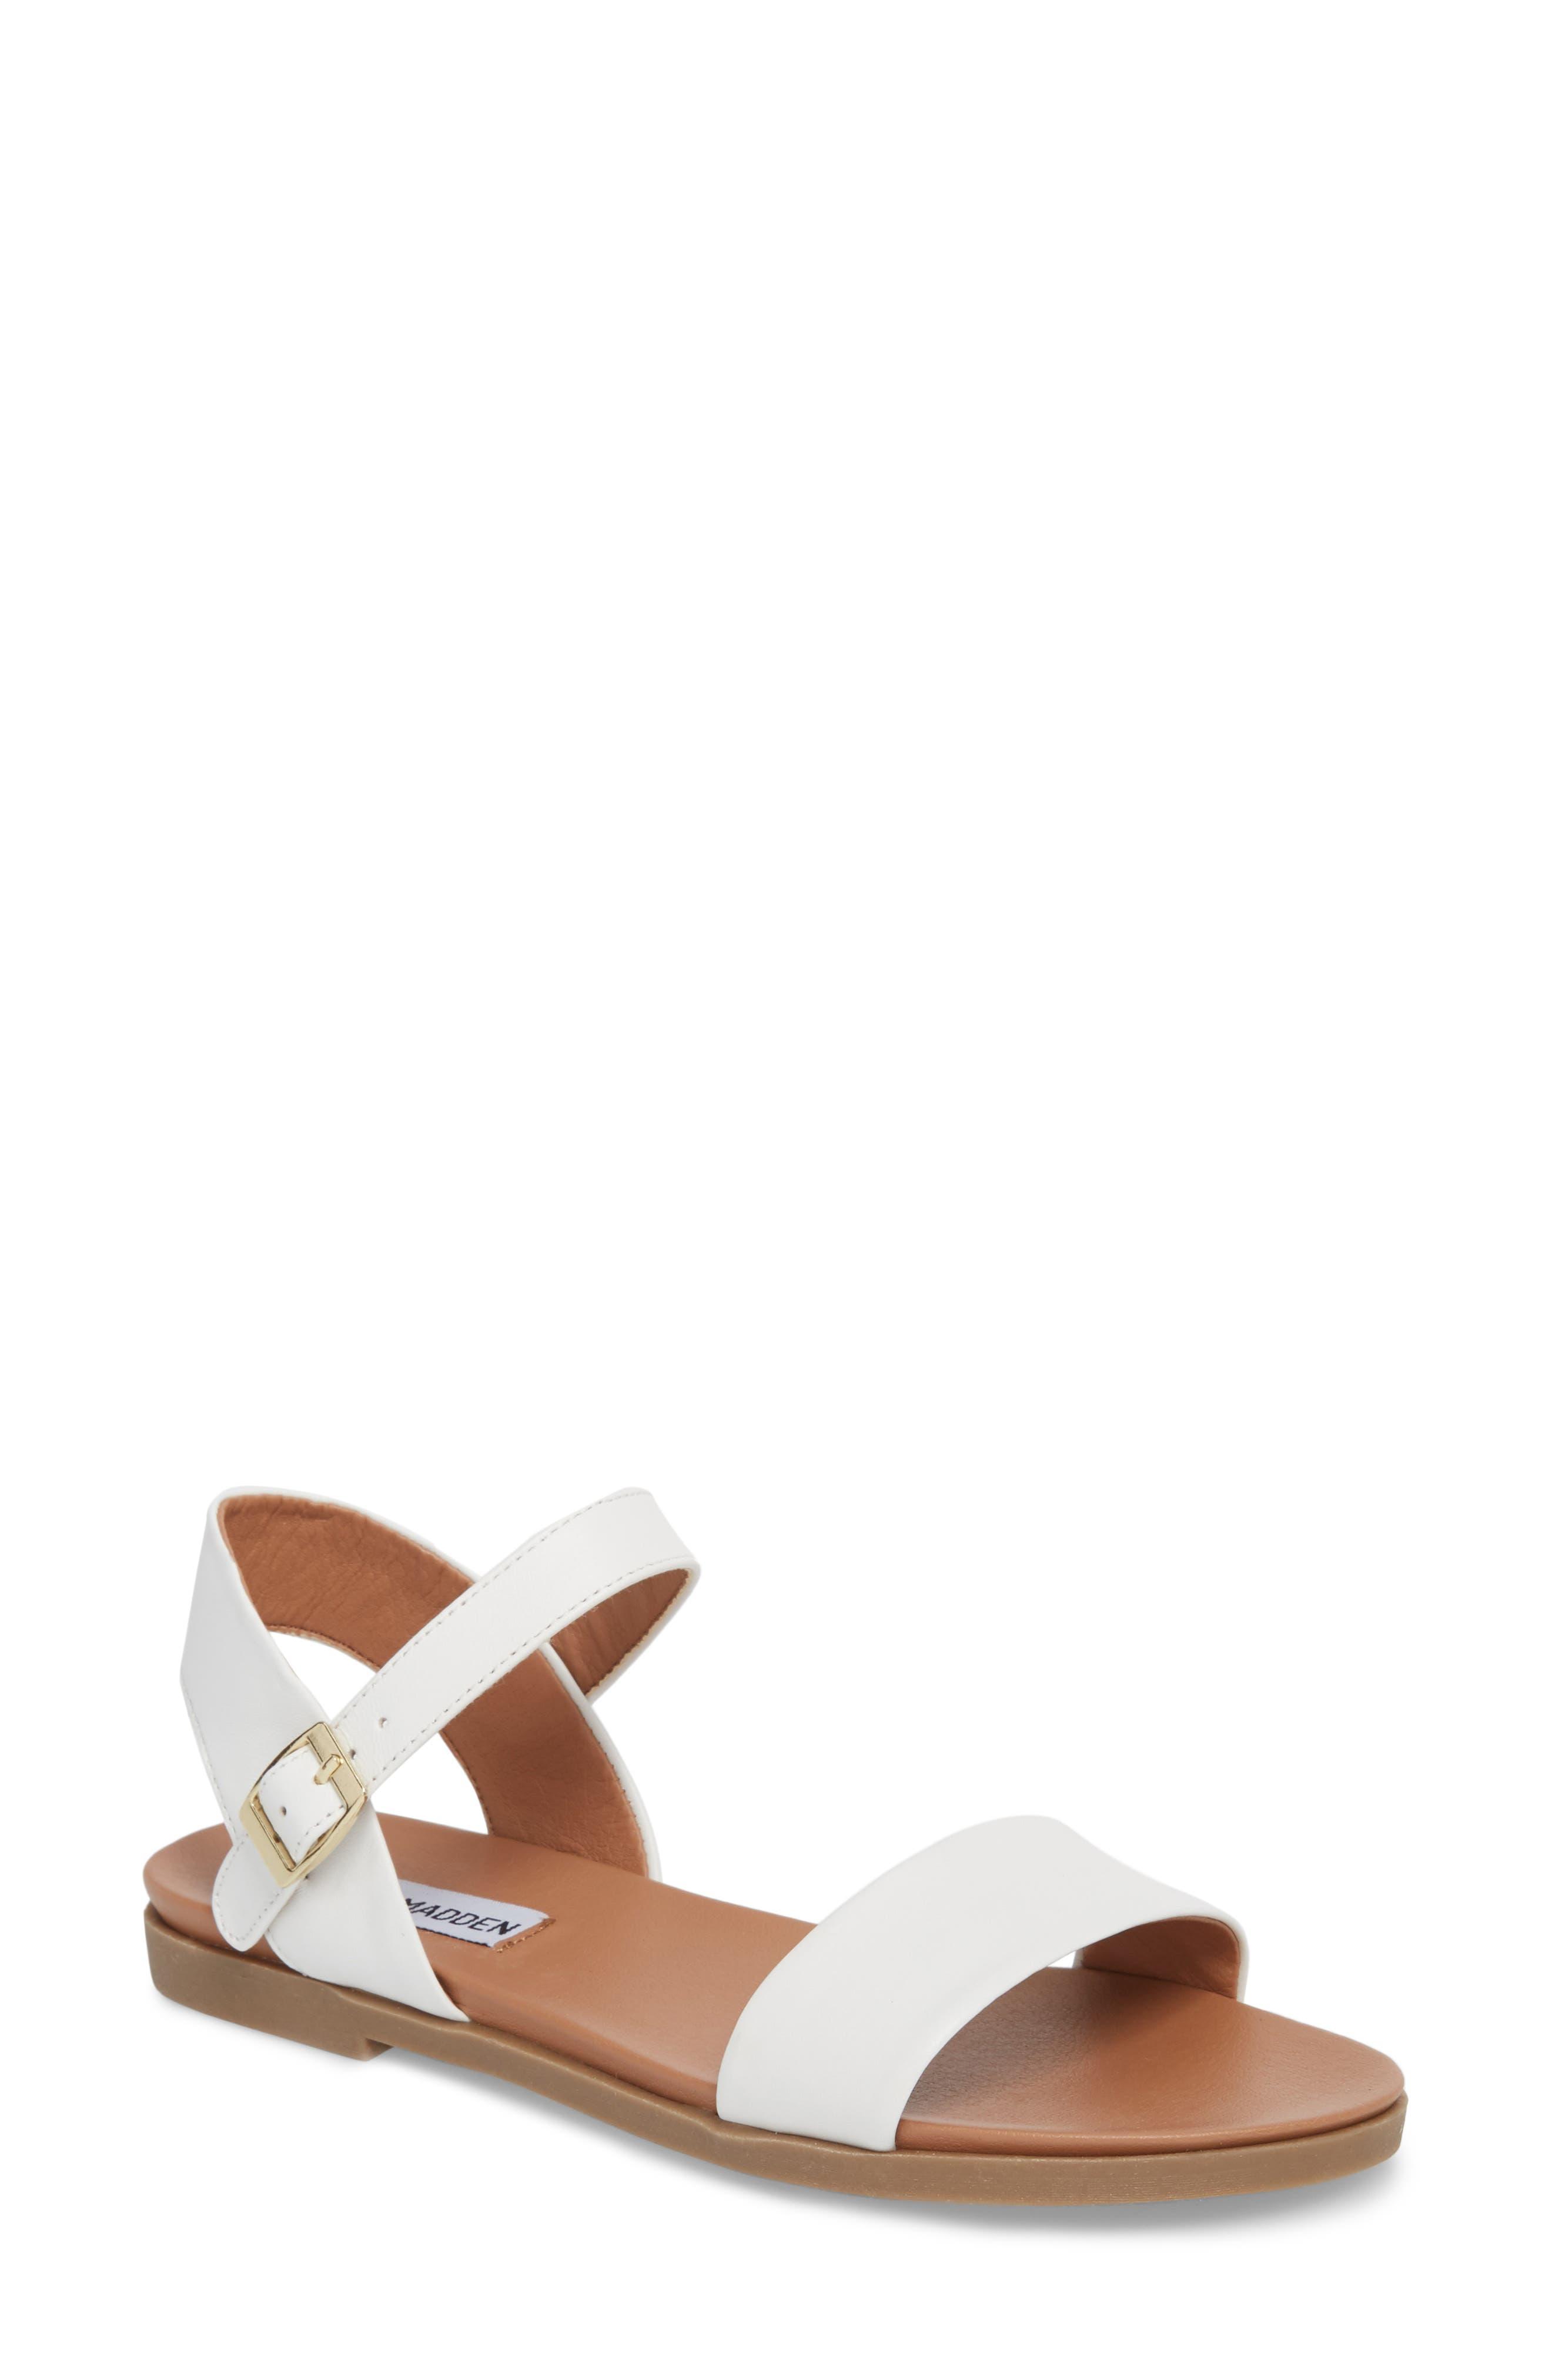 Dina Sandal,                         Main,                         color, White Leather